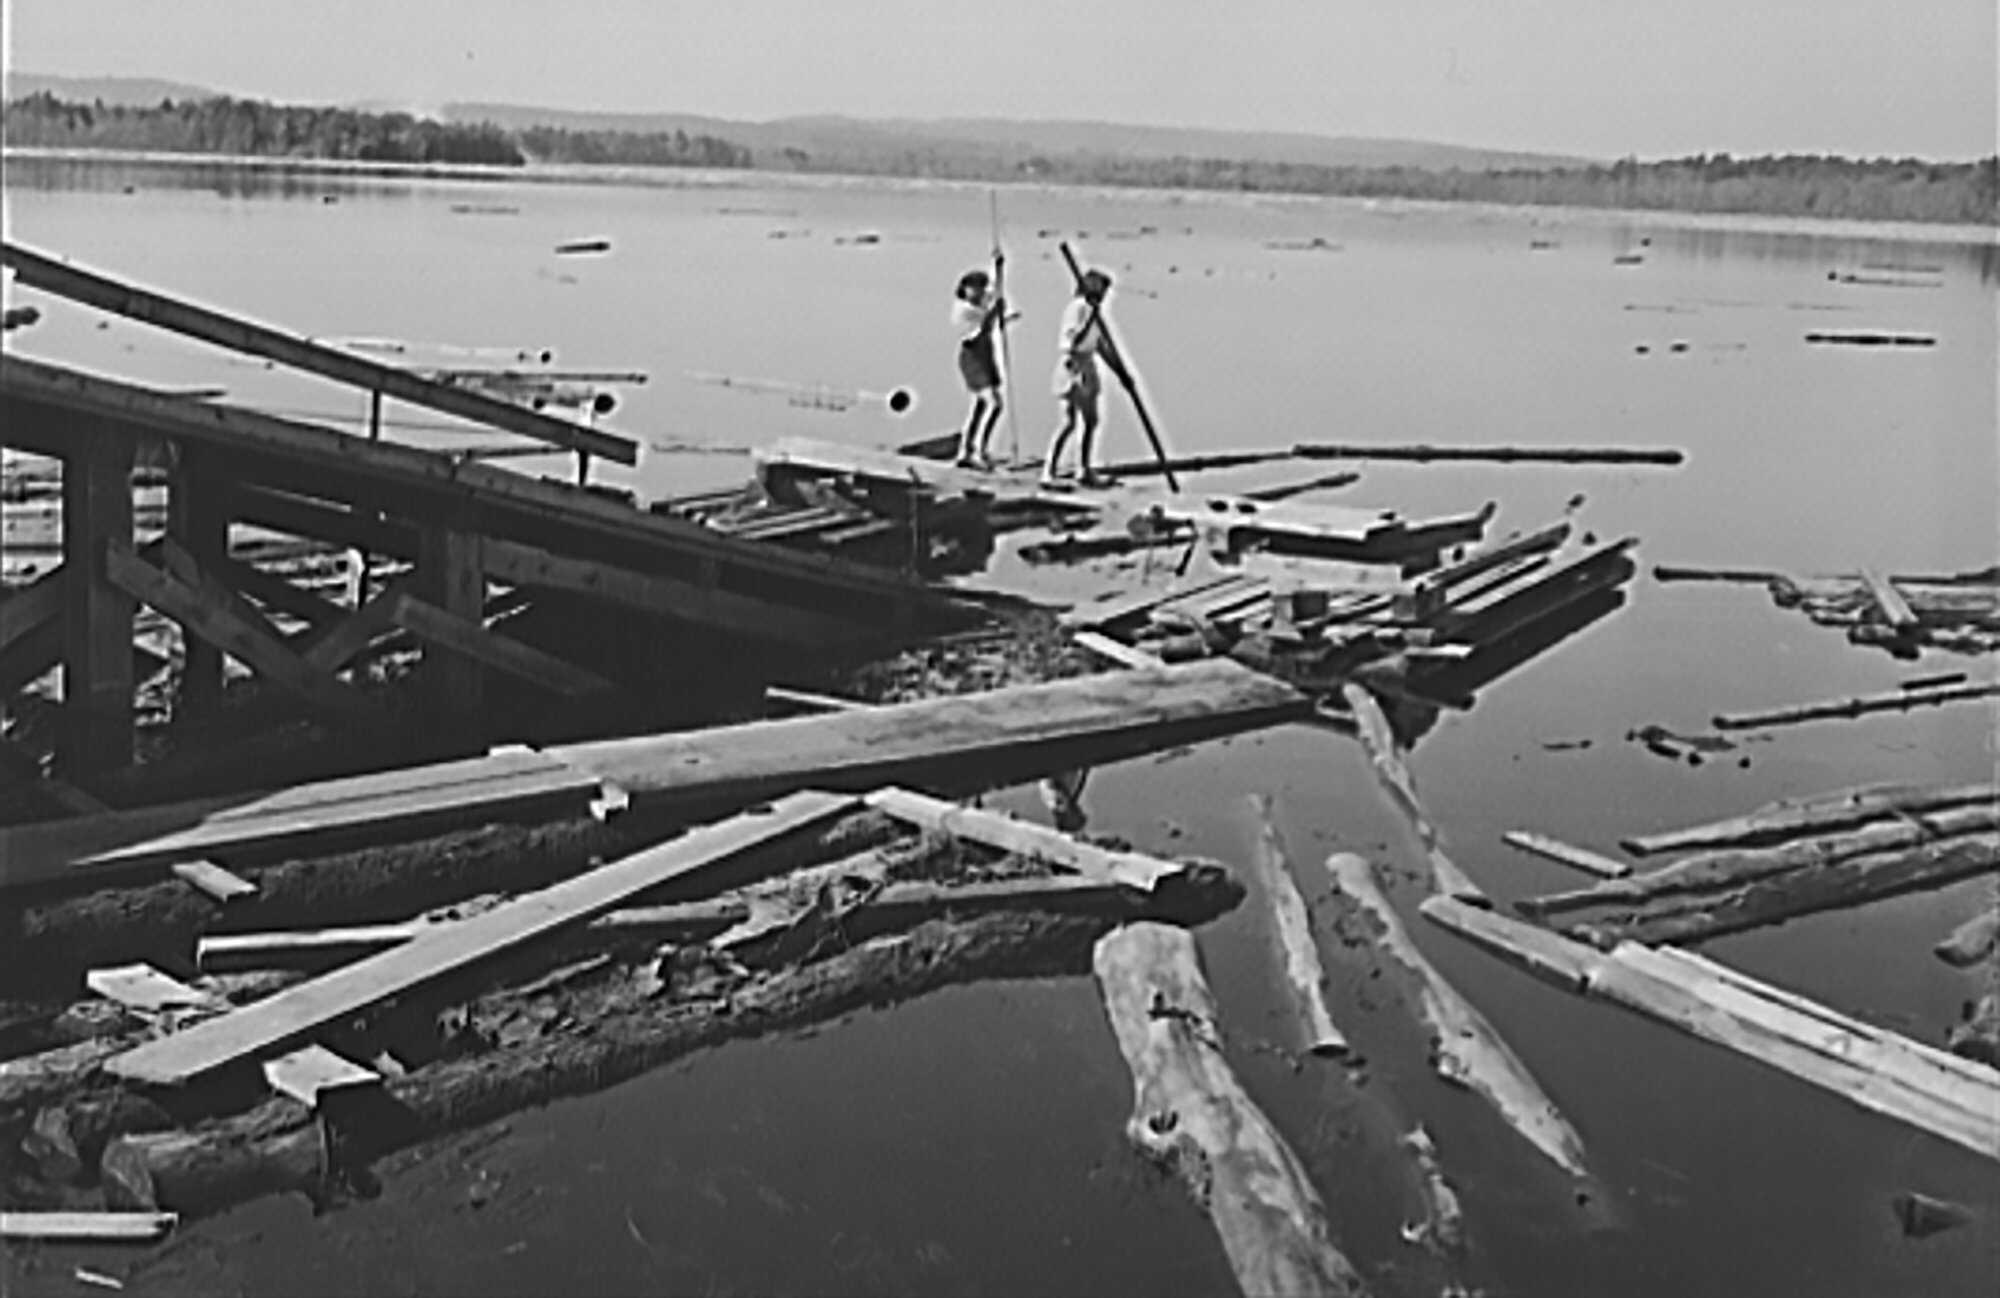 Hurricane-Aftermath-Turkey-Pond-near-Concord,-New-Hampshire-1938-LOC.jpg